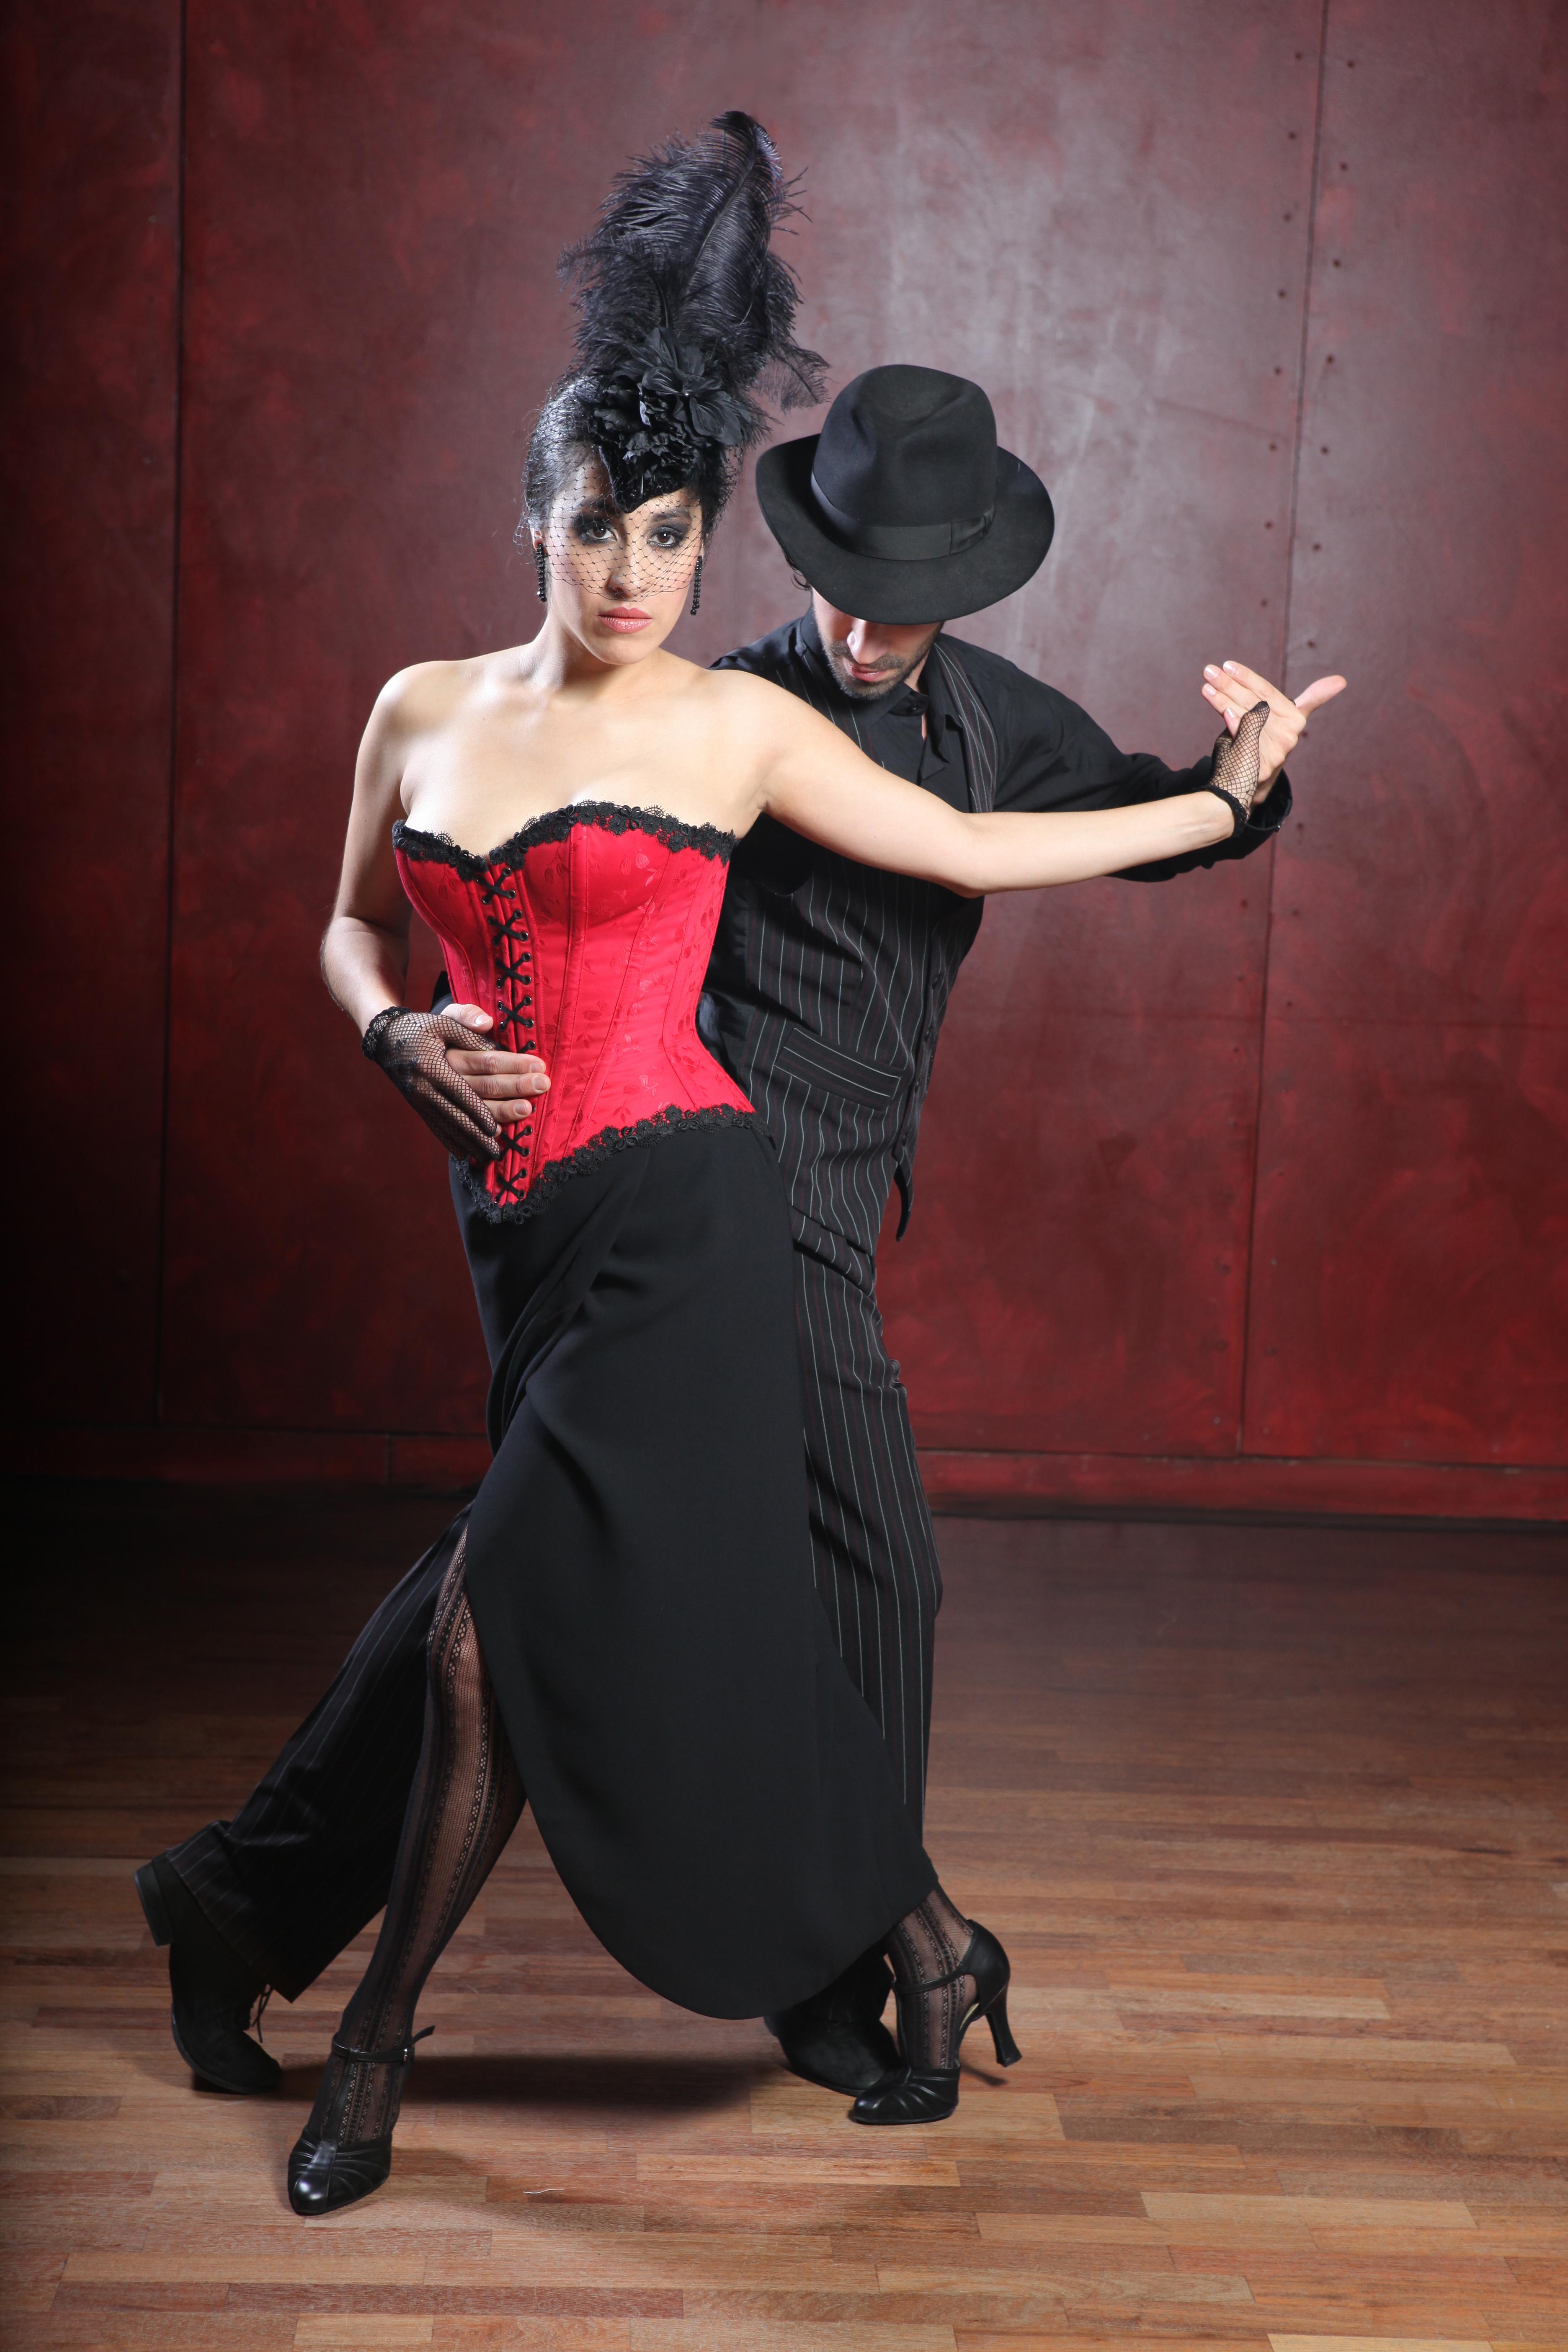 Tango Giorgio von Arb 4